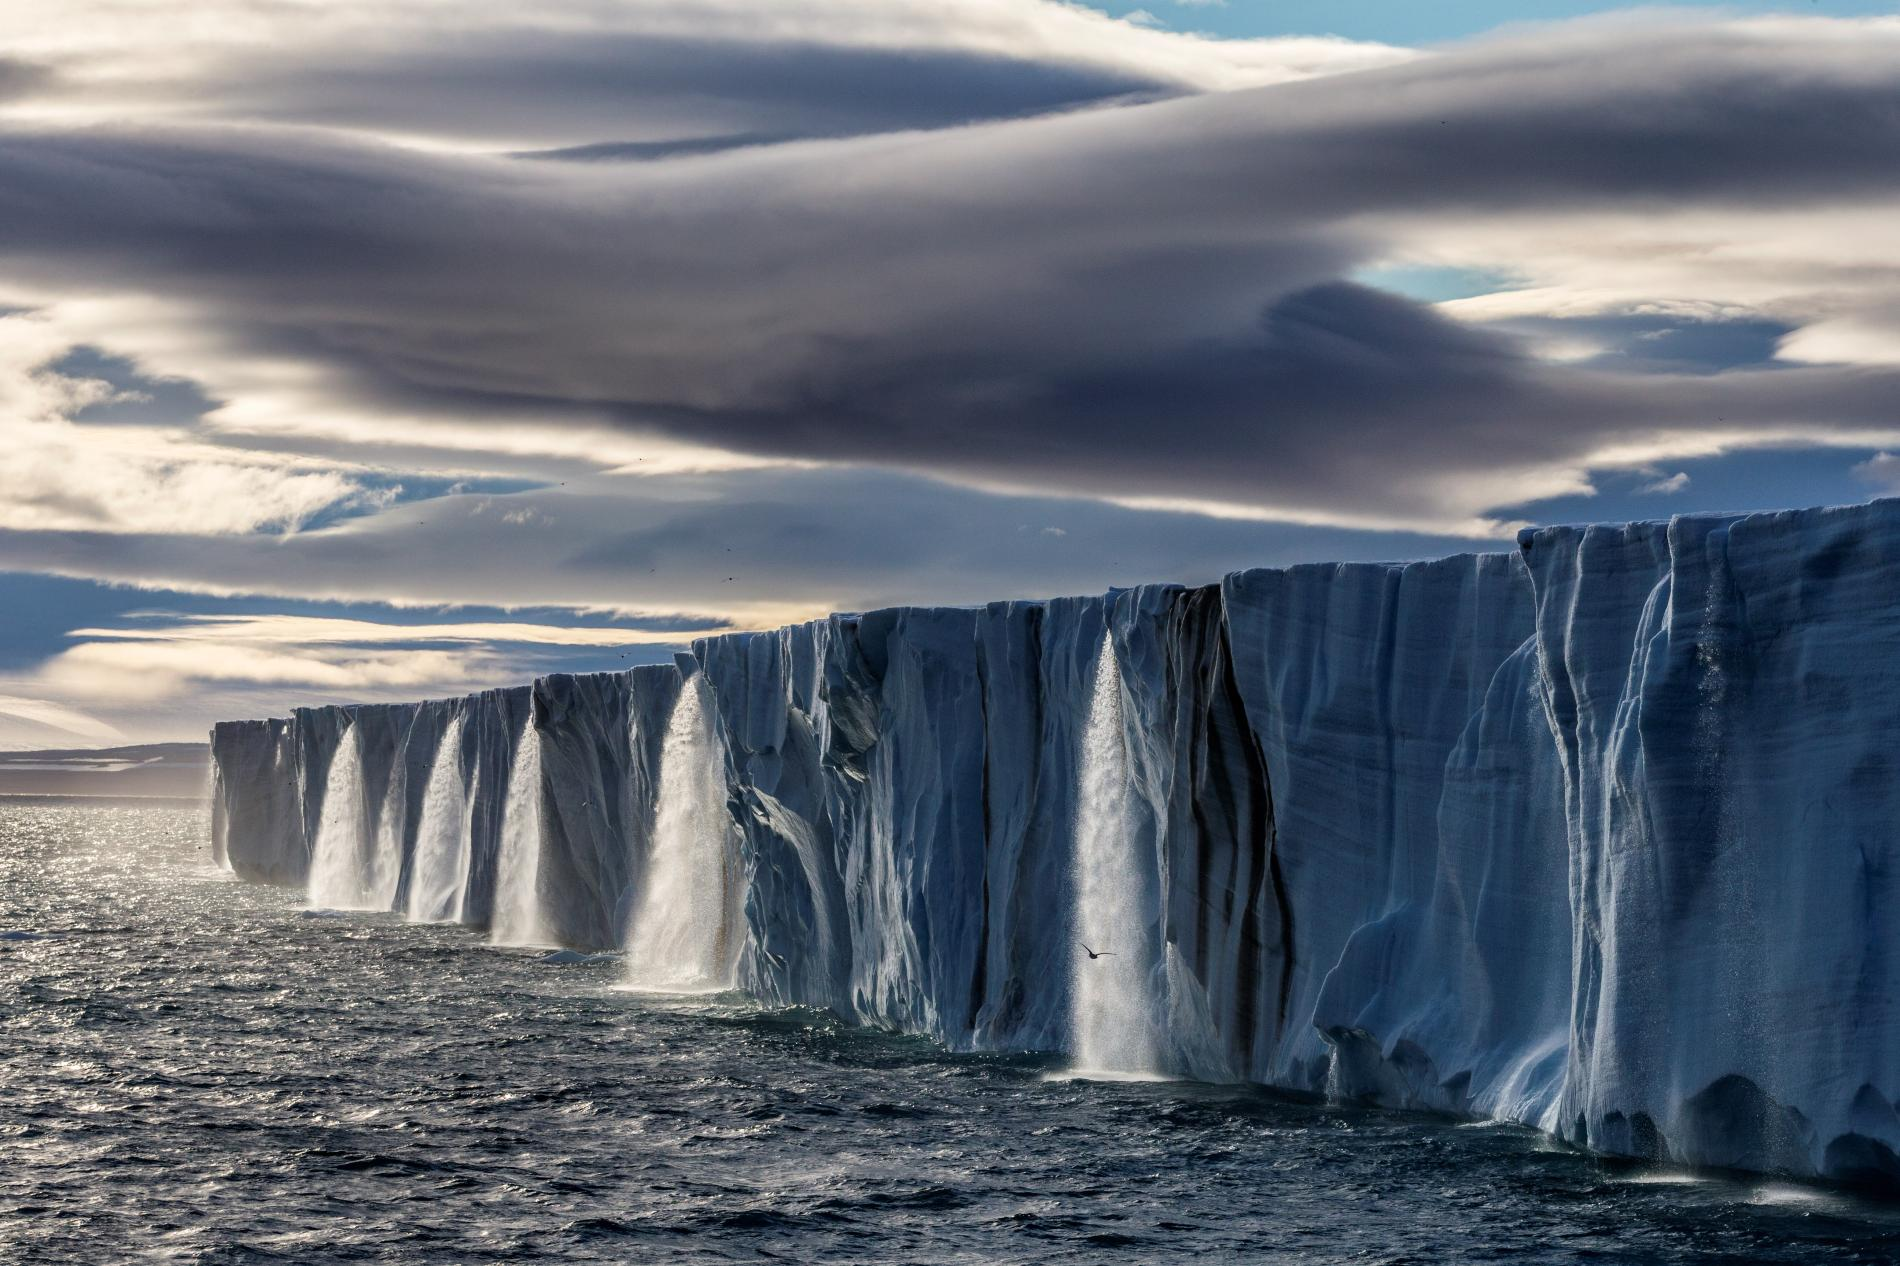 Glacier in Svalbard, Norway